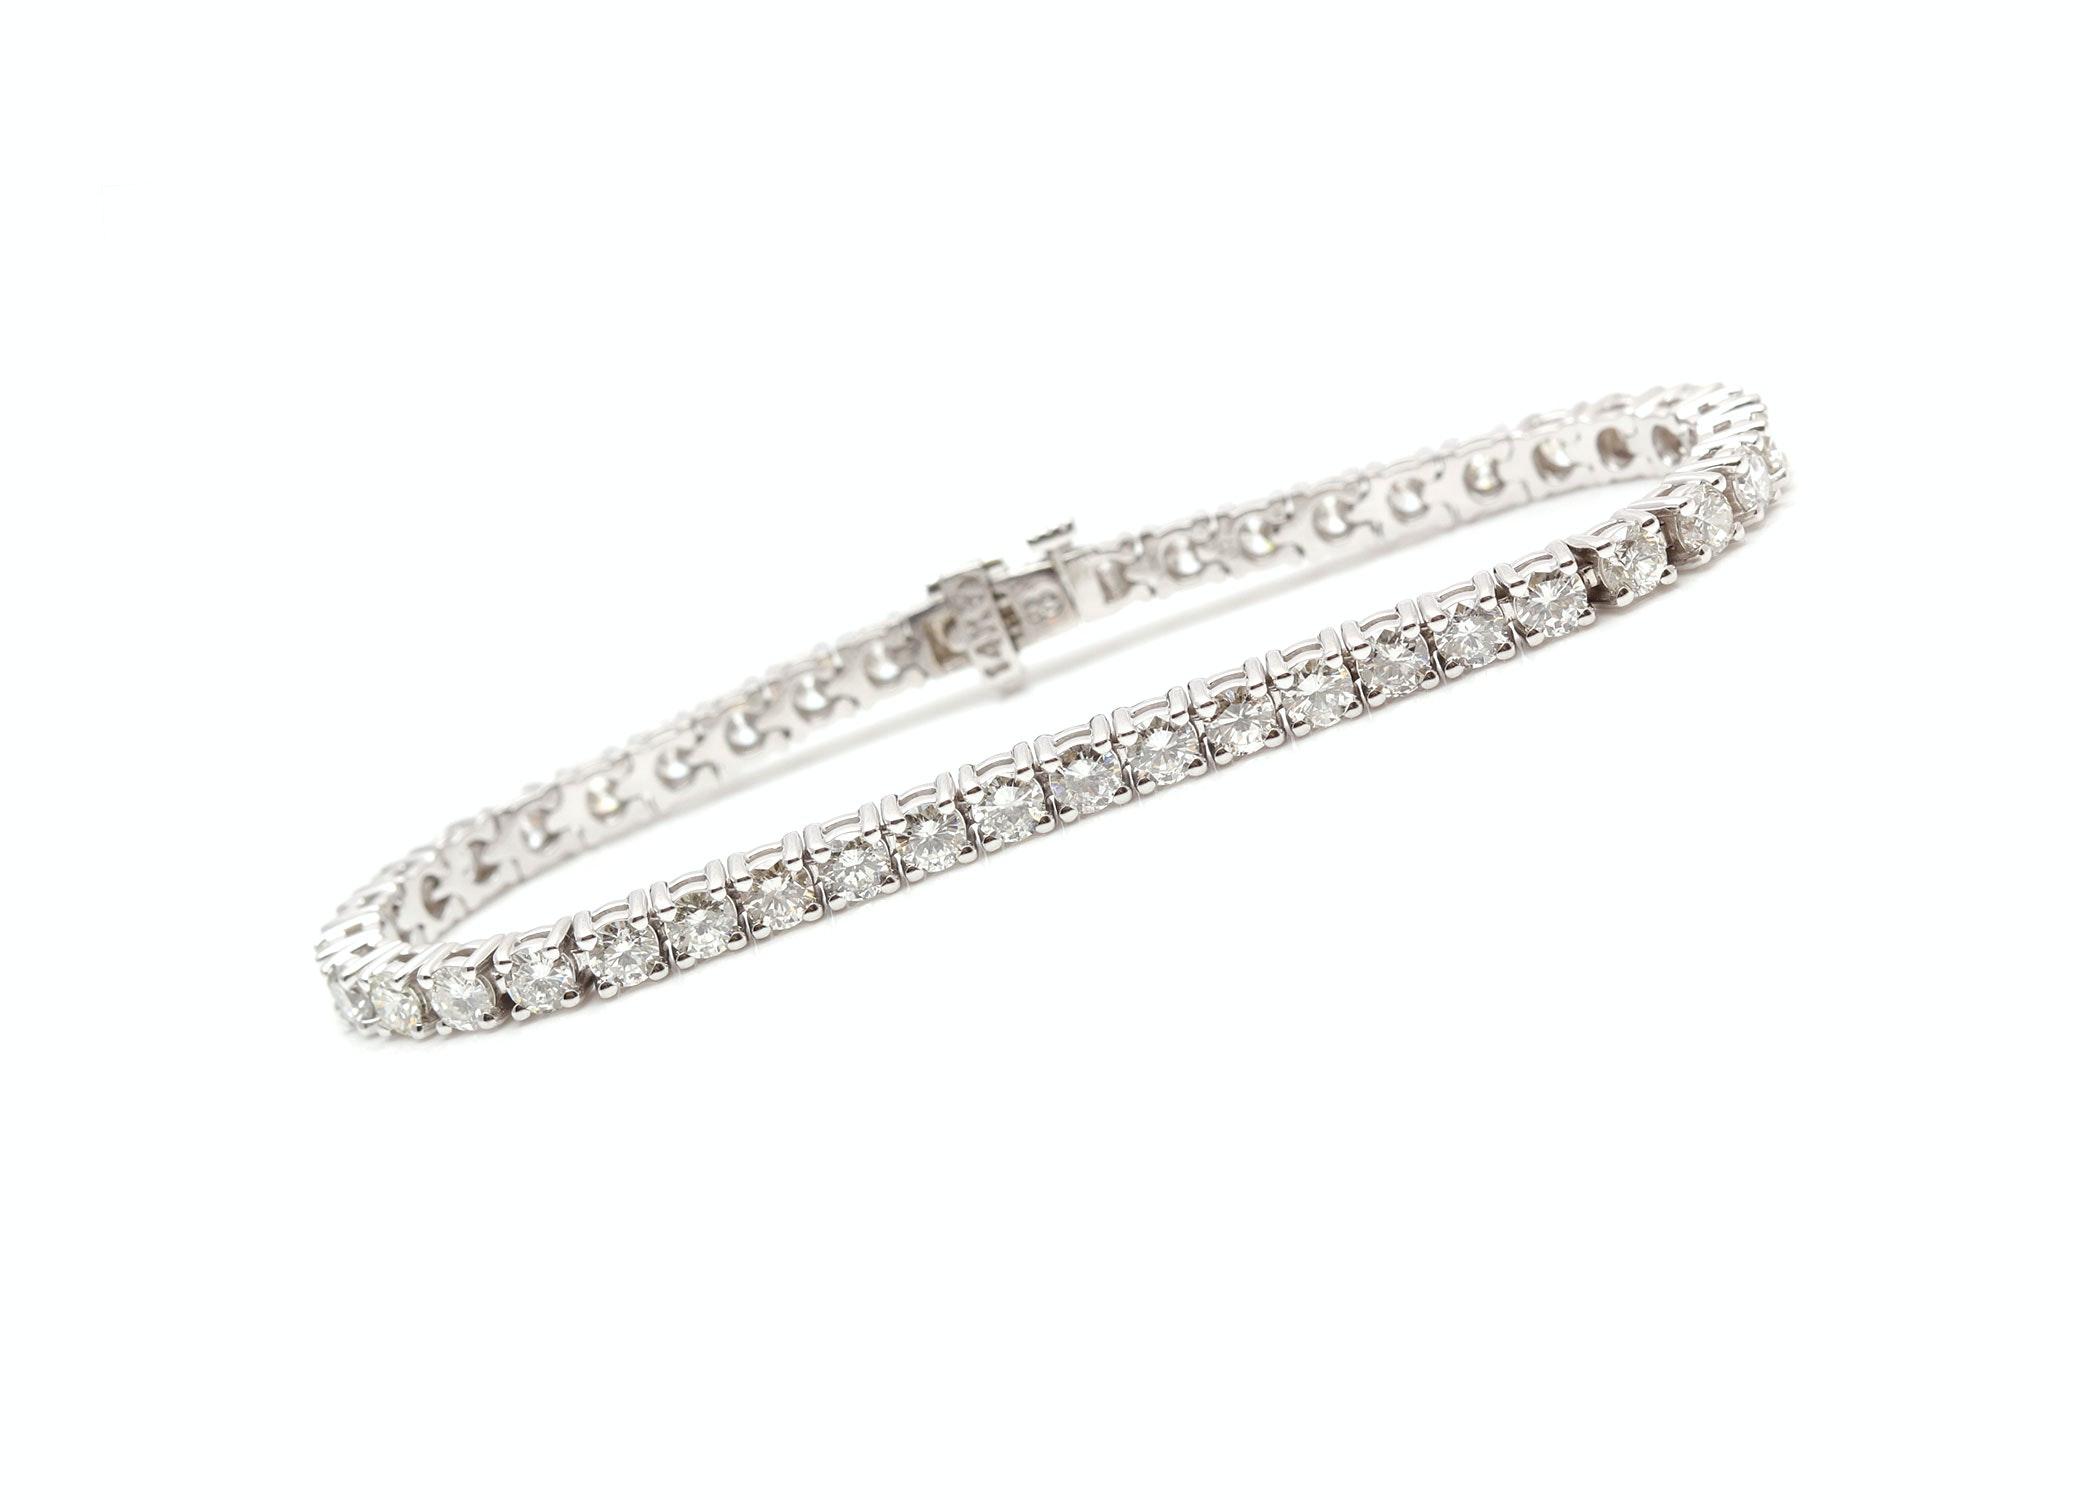 14K White Gold 8.15 CTW Diamond Bracelet